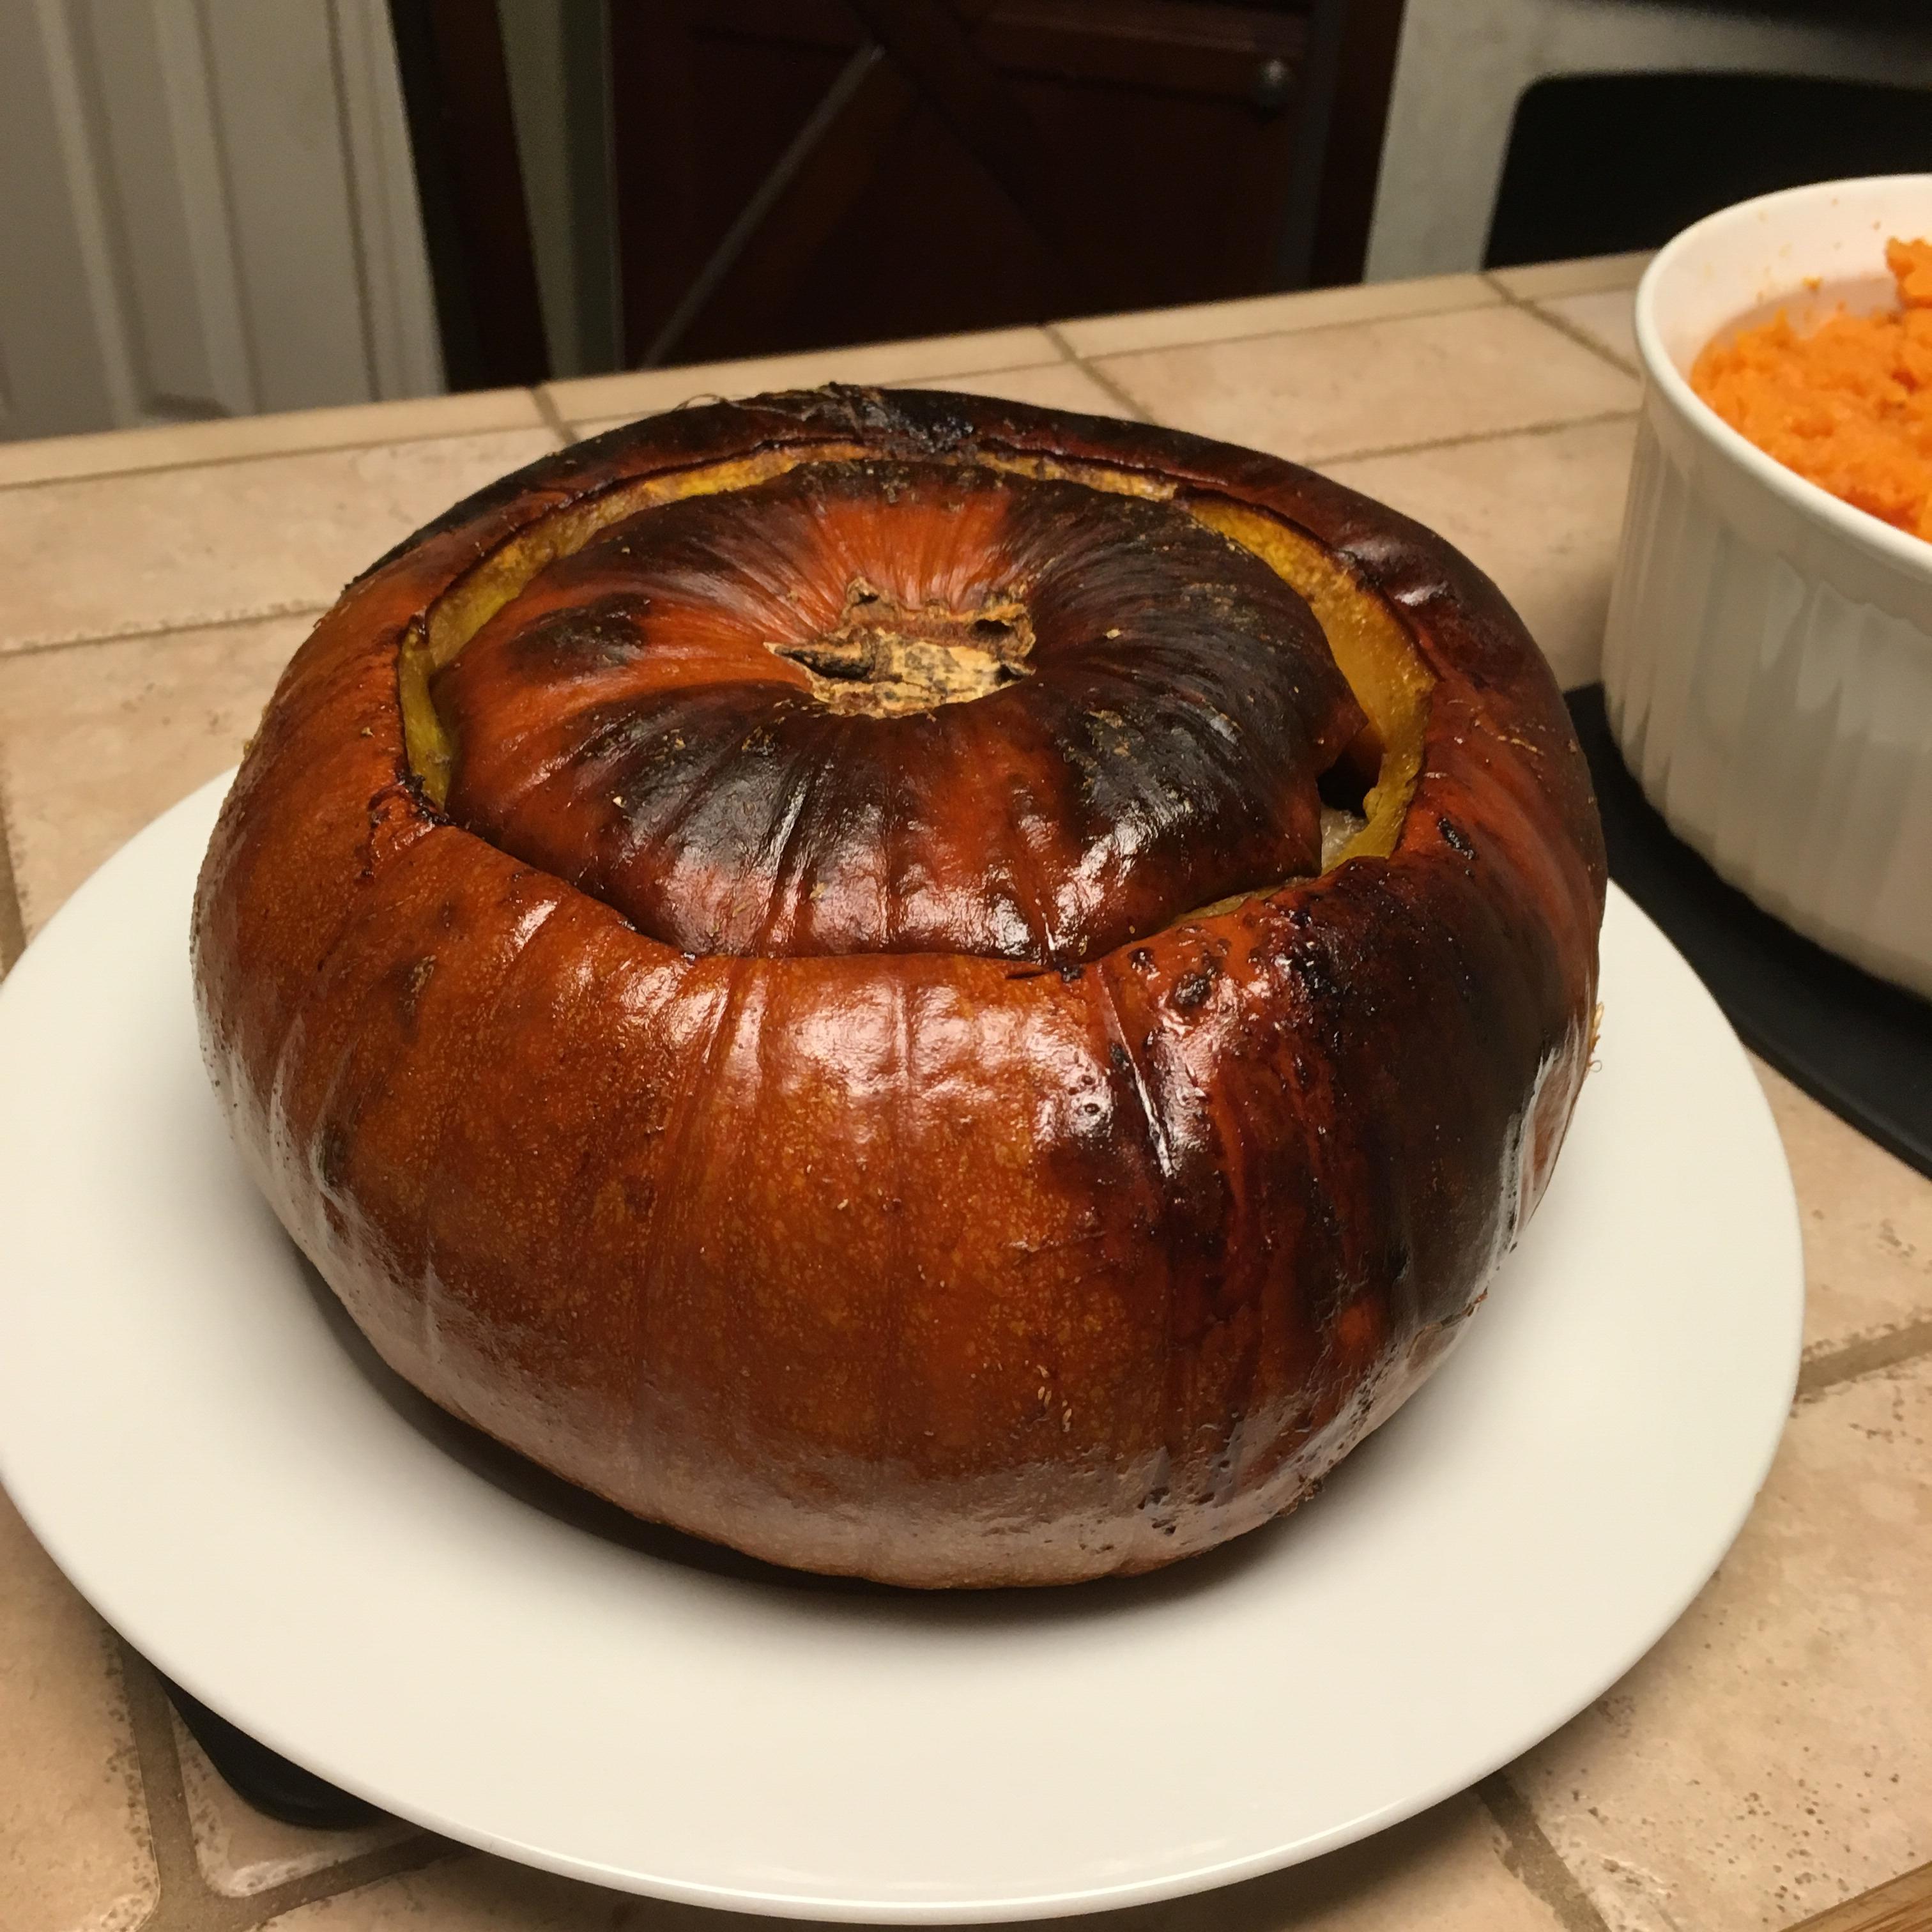 Chef John's Pumpkin-Braised Pork antulien